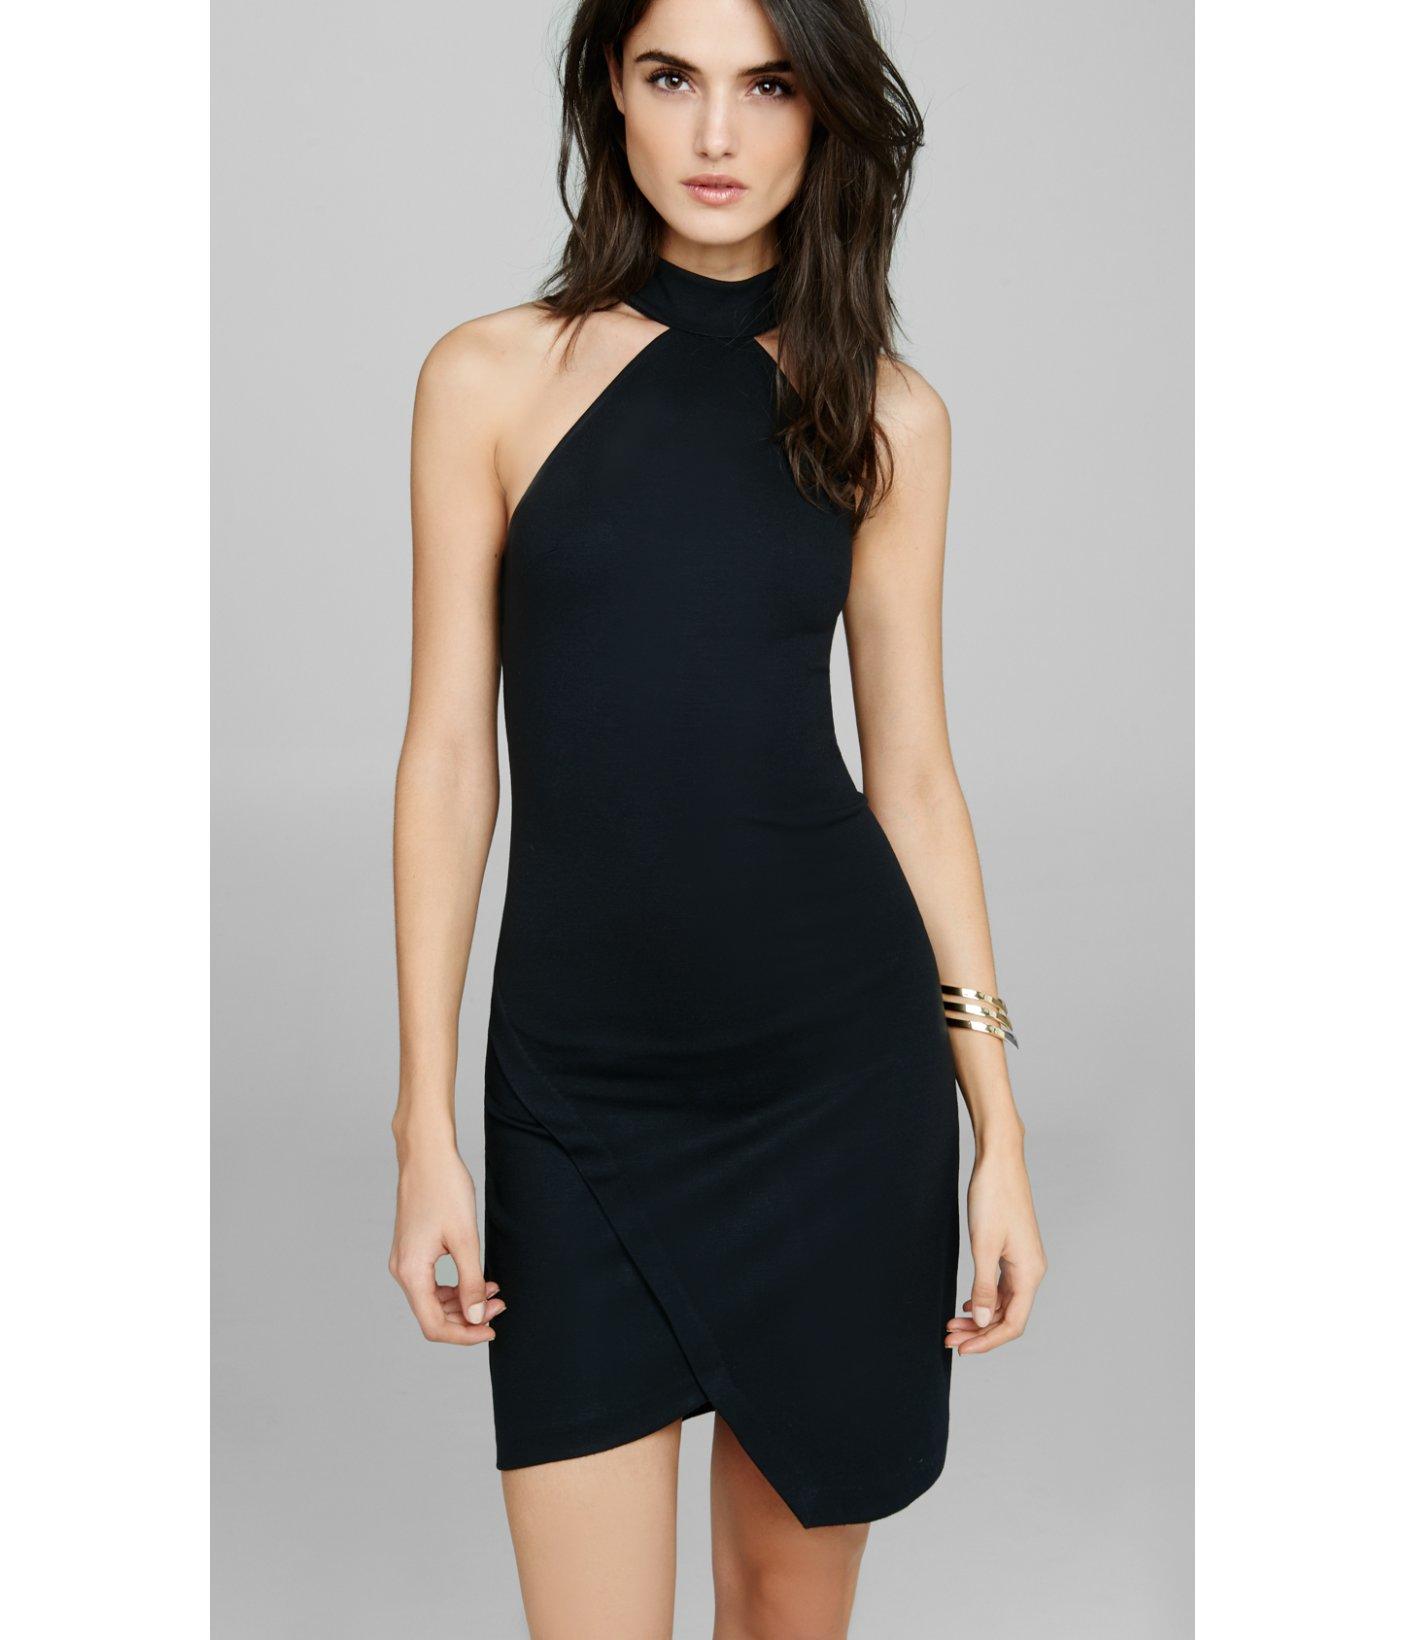 802dcc07 Express High Neck Halter Sheath Dress in Black - Lyst